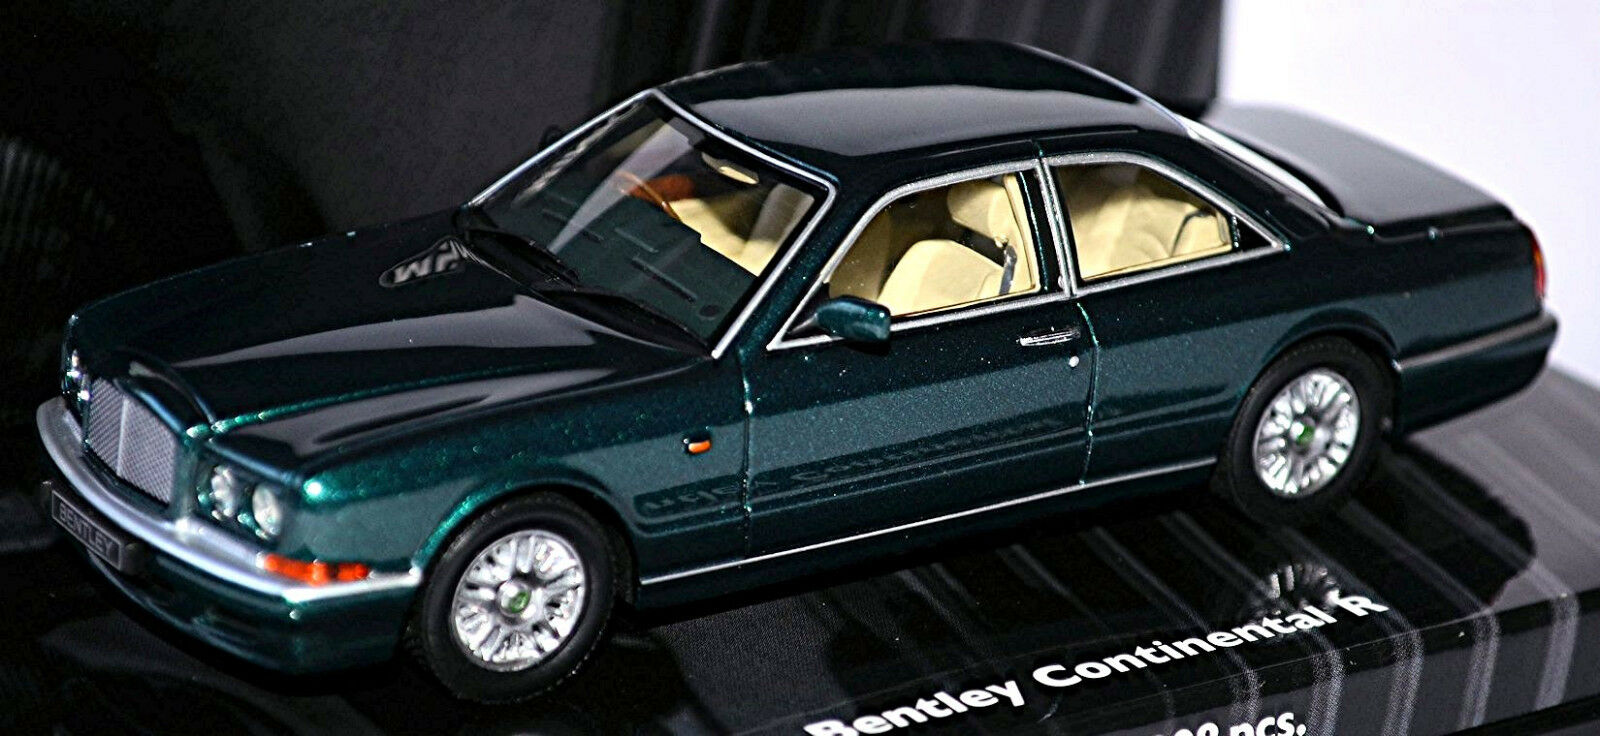 Bentley Continental R 1991-2002 vert metallic 1 43 Minichamps Limousine Ed 1,008pcs